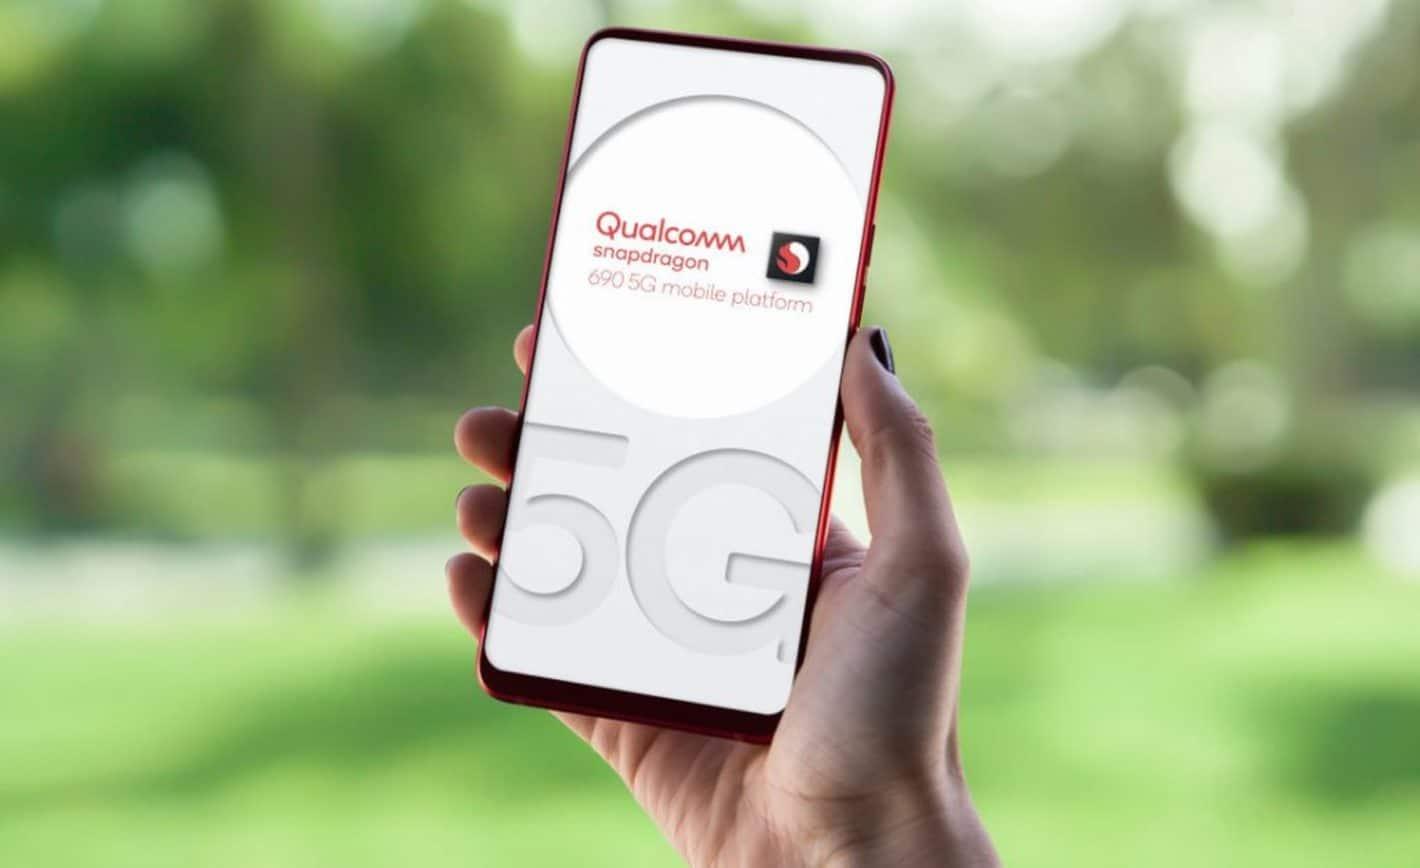 Qualcomm Snapdragon 690 chipset to bring 5G to mid-range smartphones